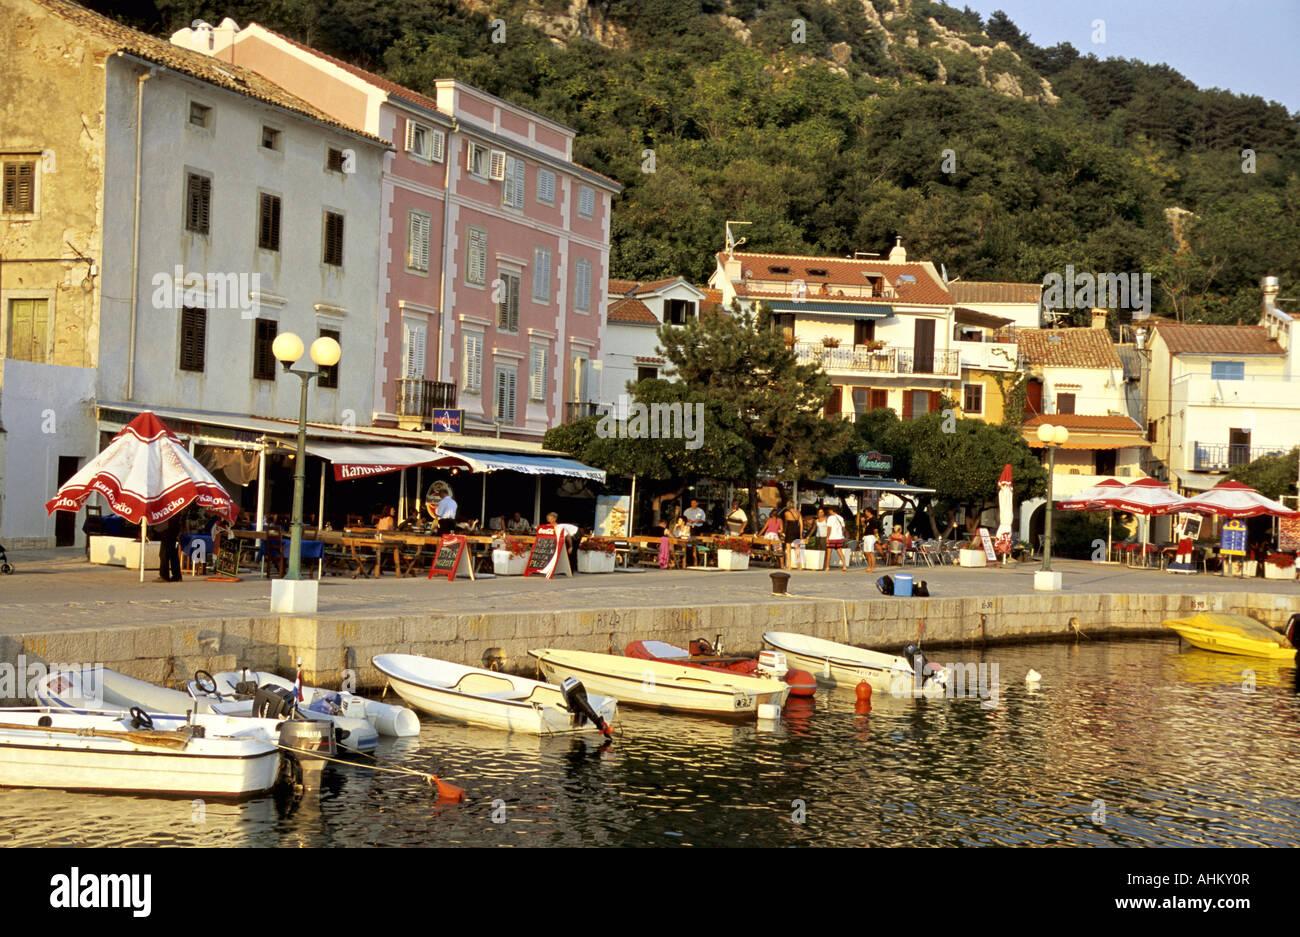 HRV Kroatien Krk  Altstadt und Promenade von Baska Insel KrK Croatia  Old Town and Promenade of Baska Island Stock Photo